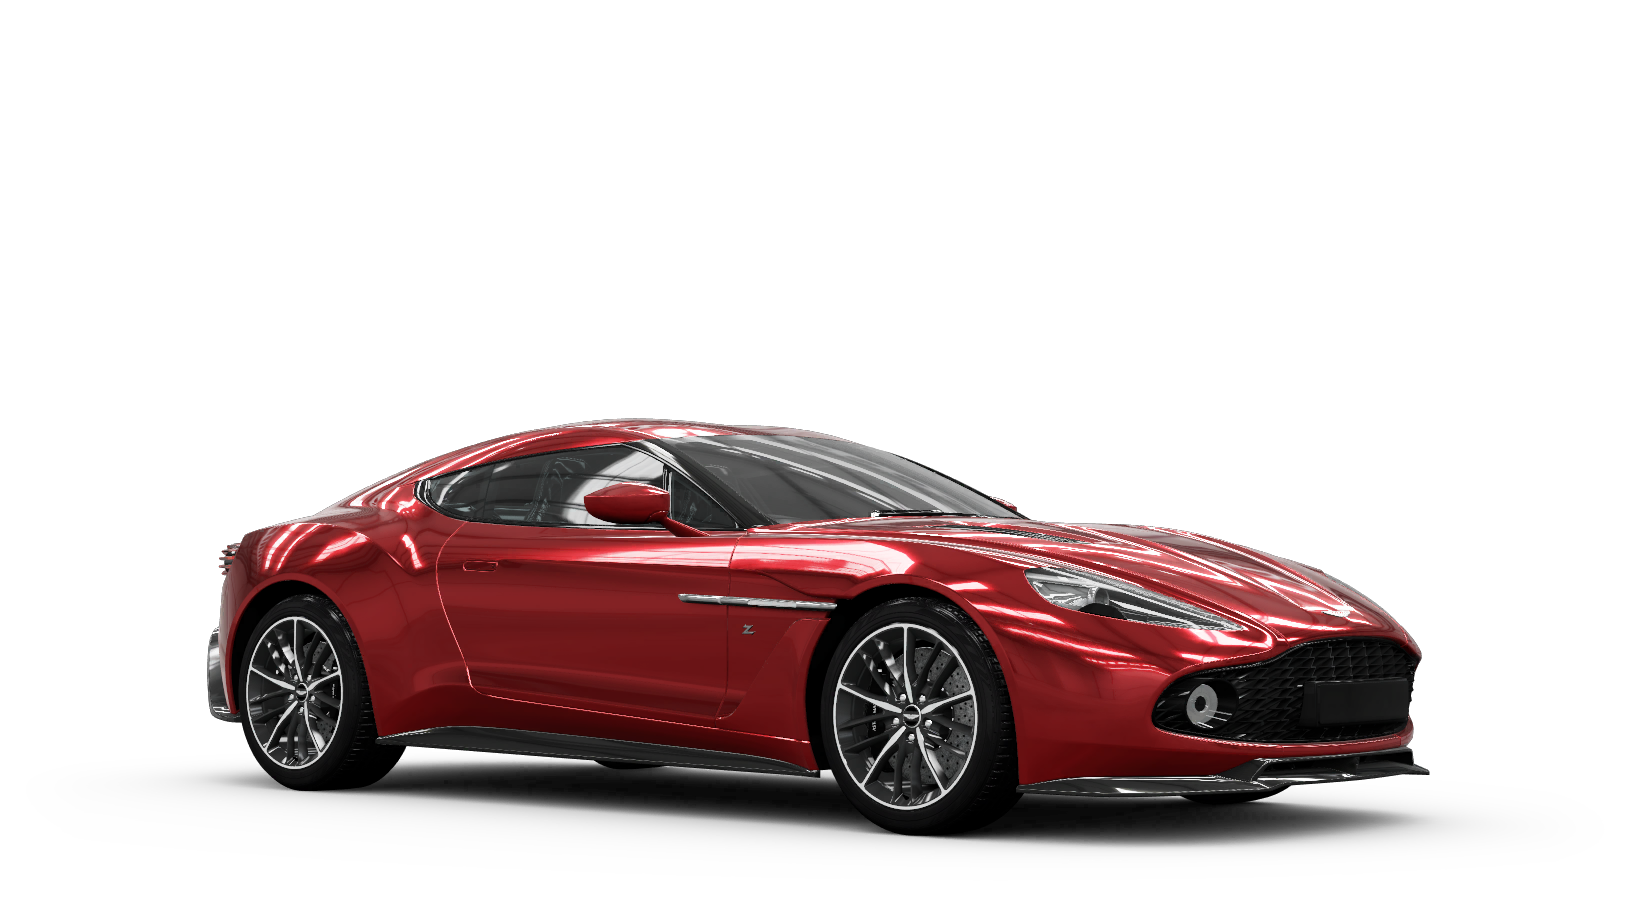 Forza-Horizon-4-Aston-Martin-Vanquish-Zagato-Coupé